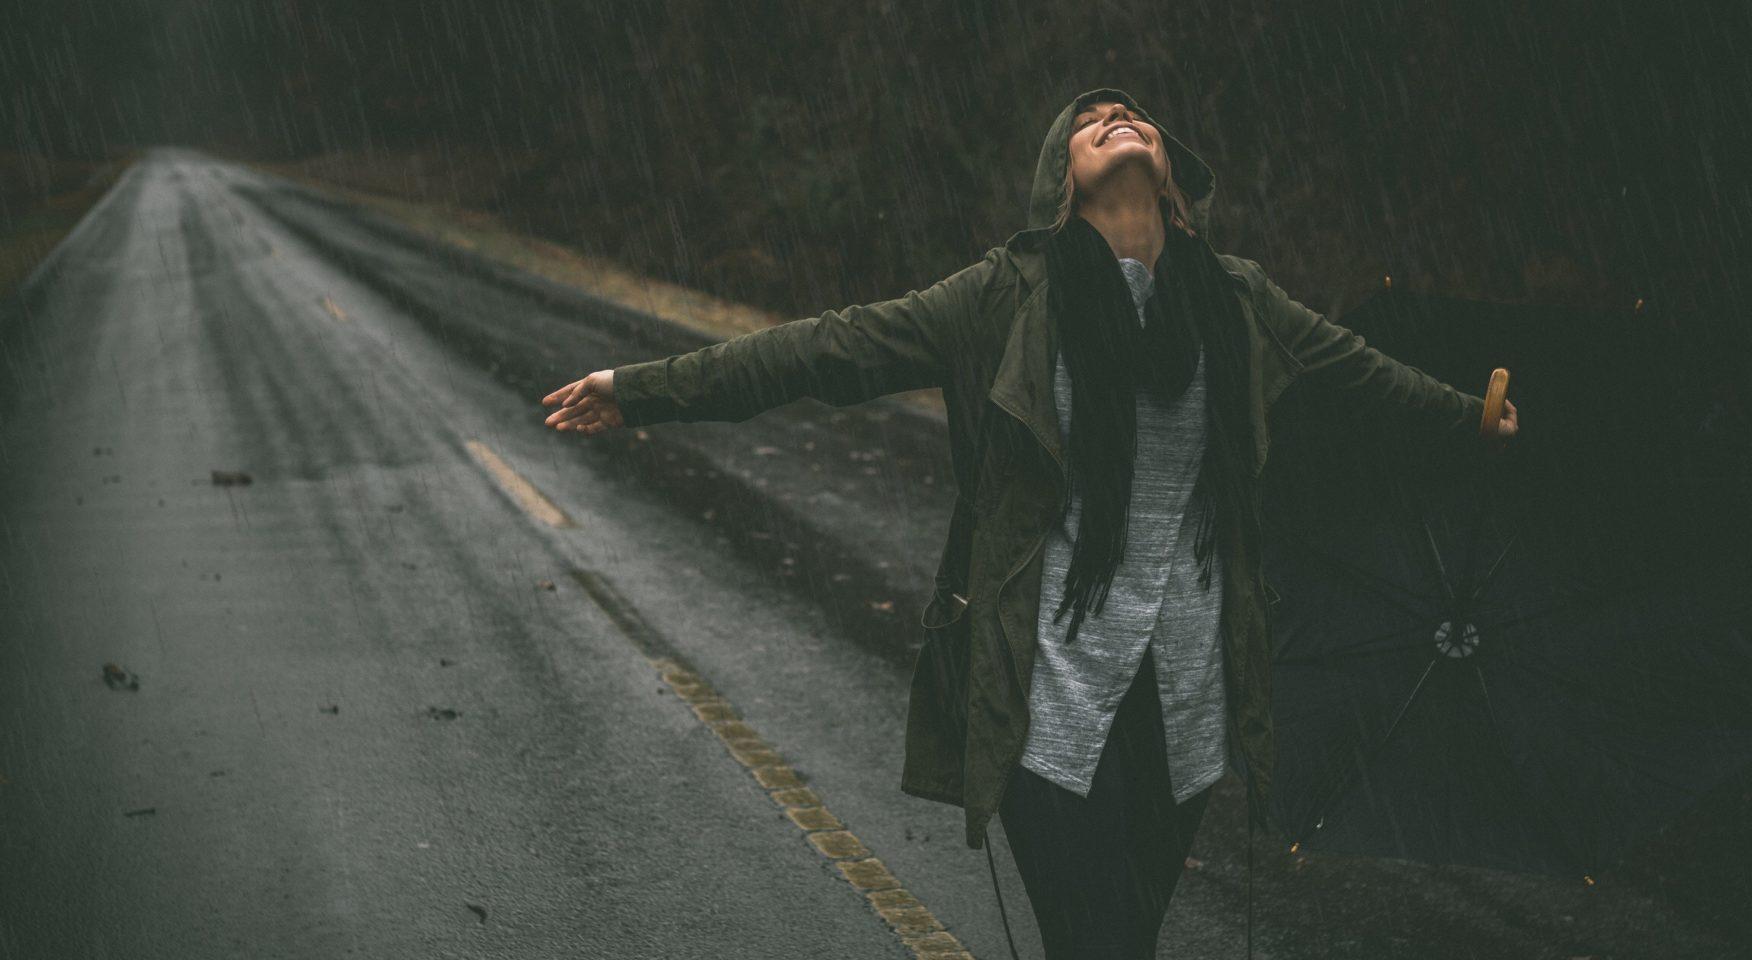 happy woman standing on rainy road